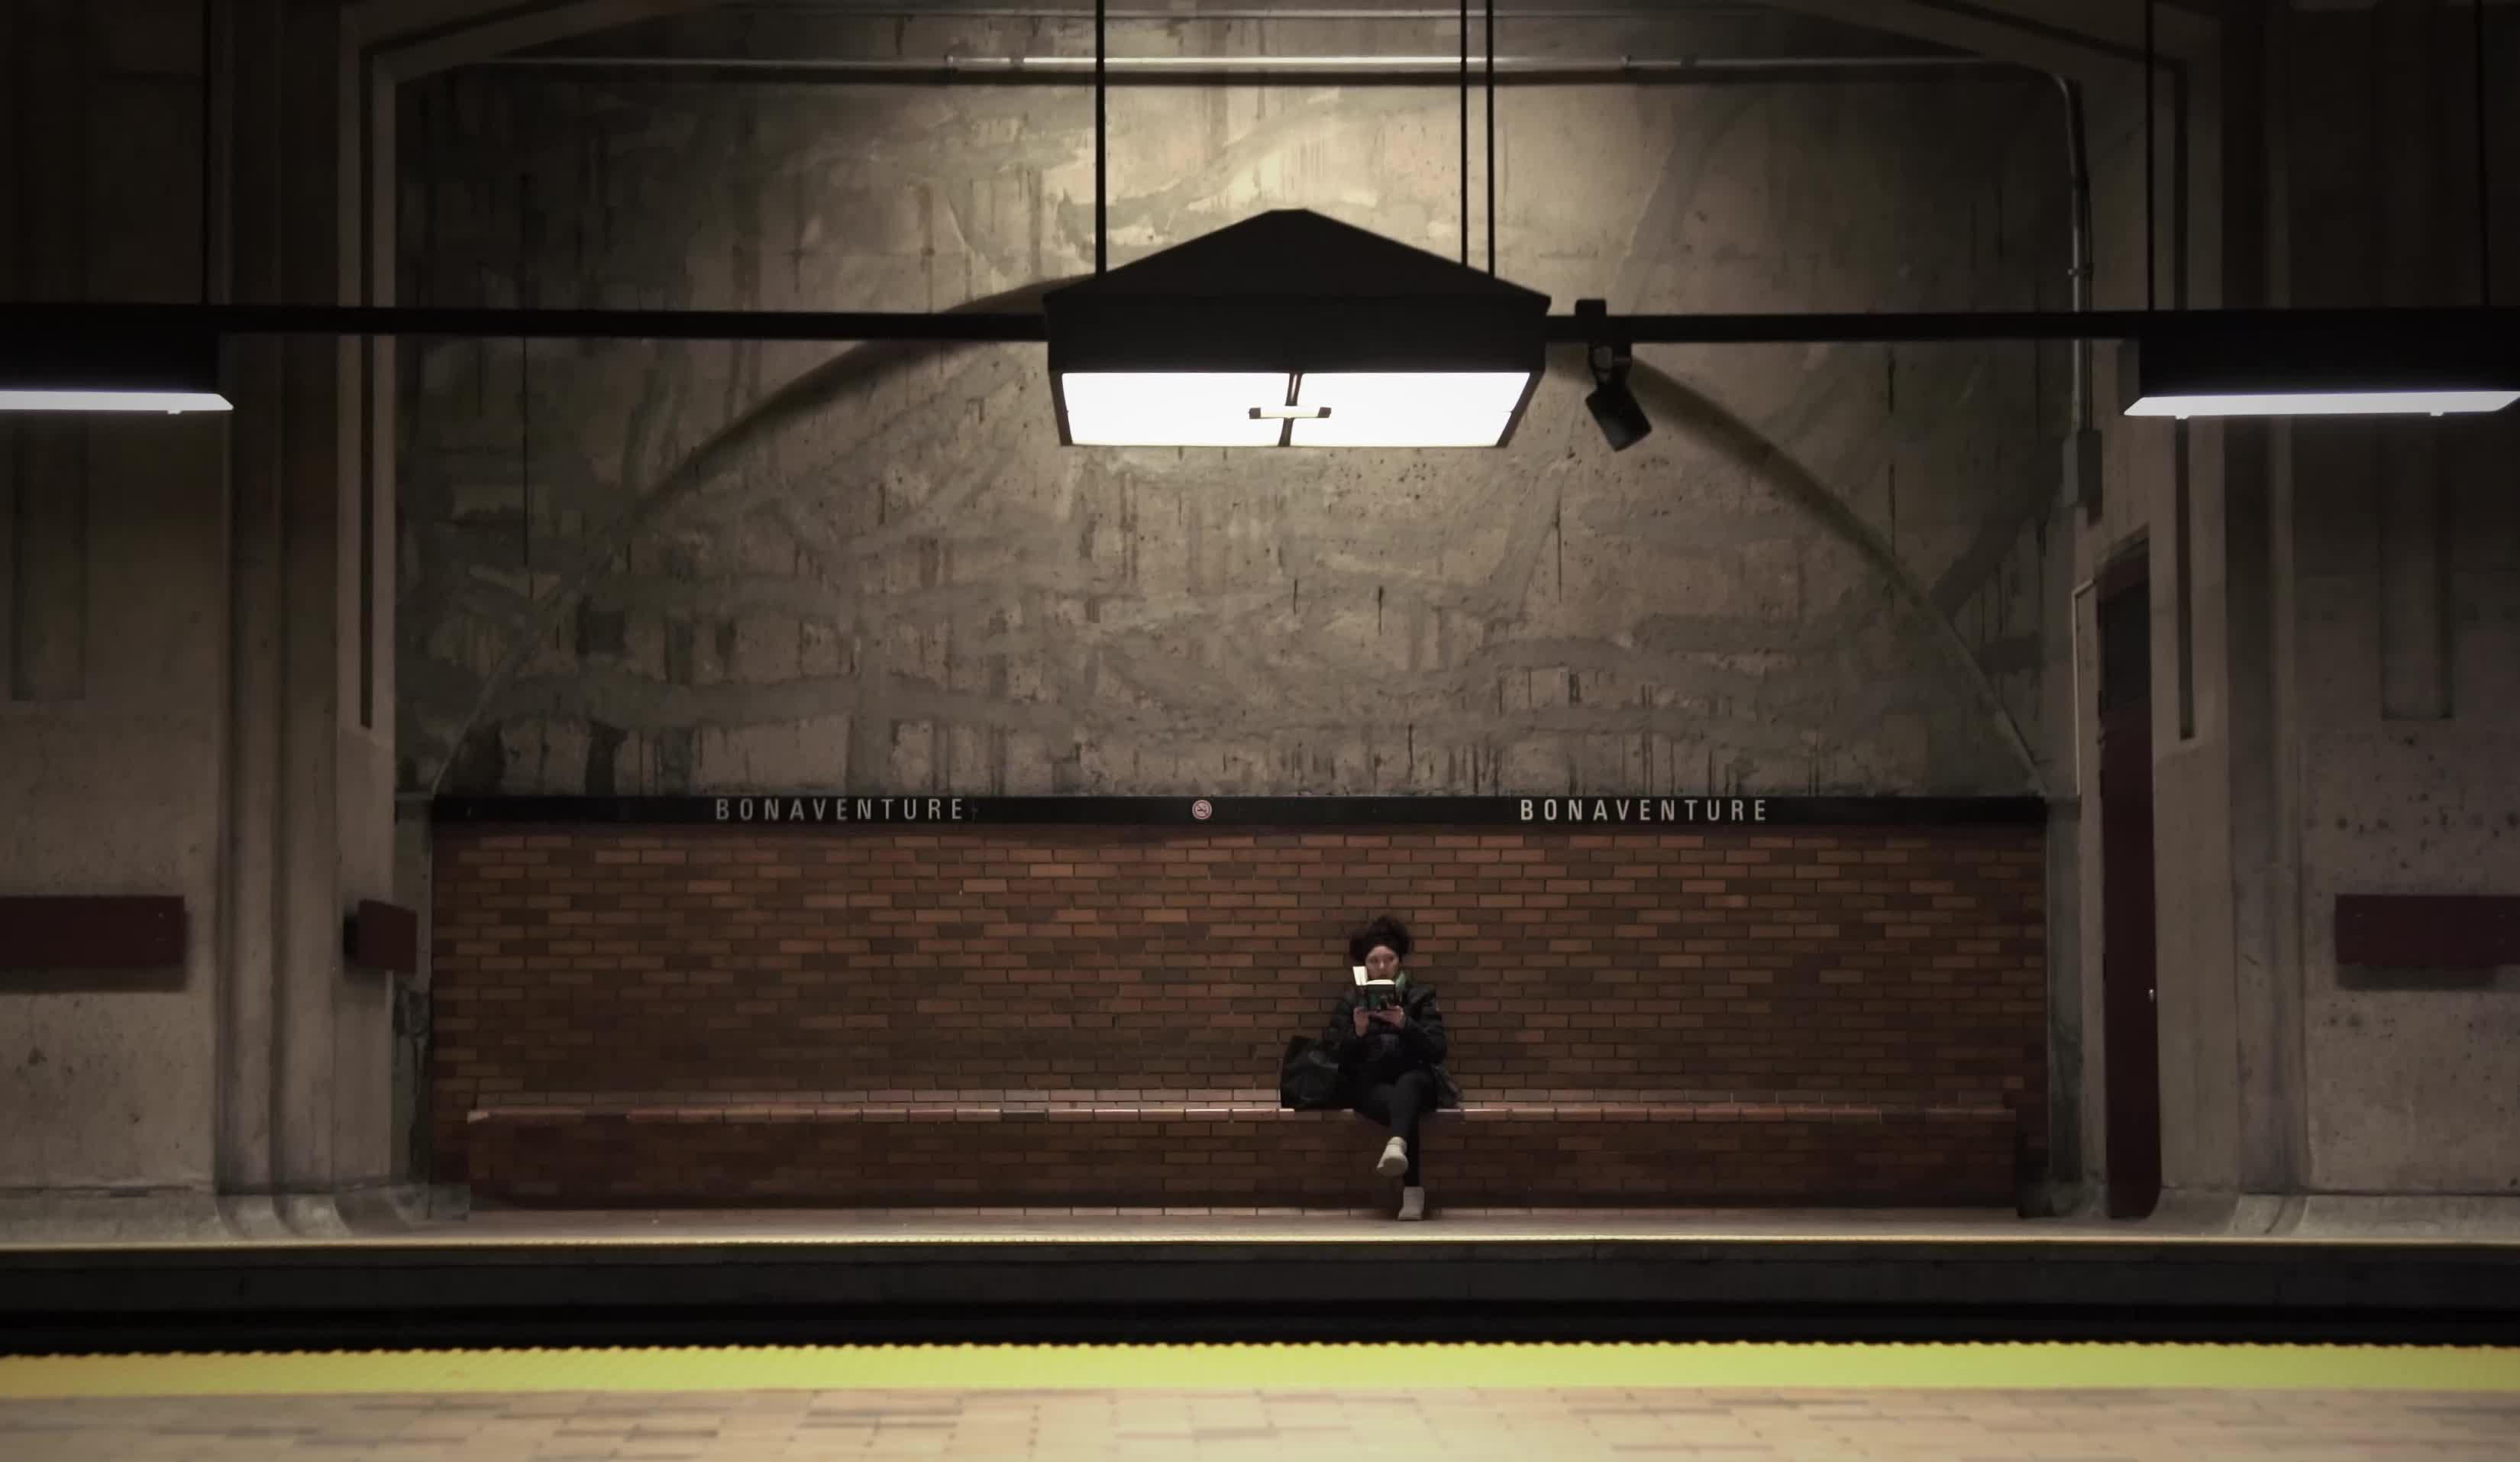 Montreal Metro Loop #12 GIFs